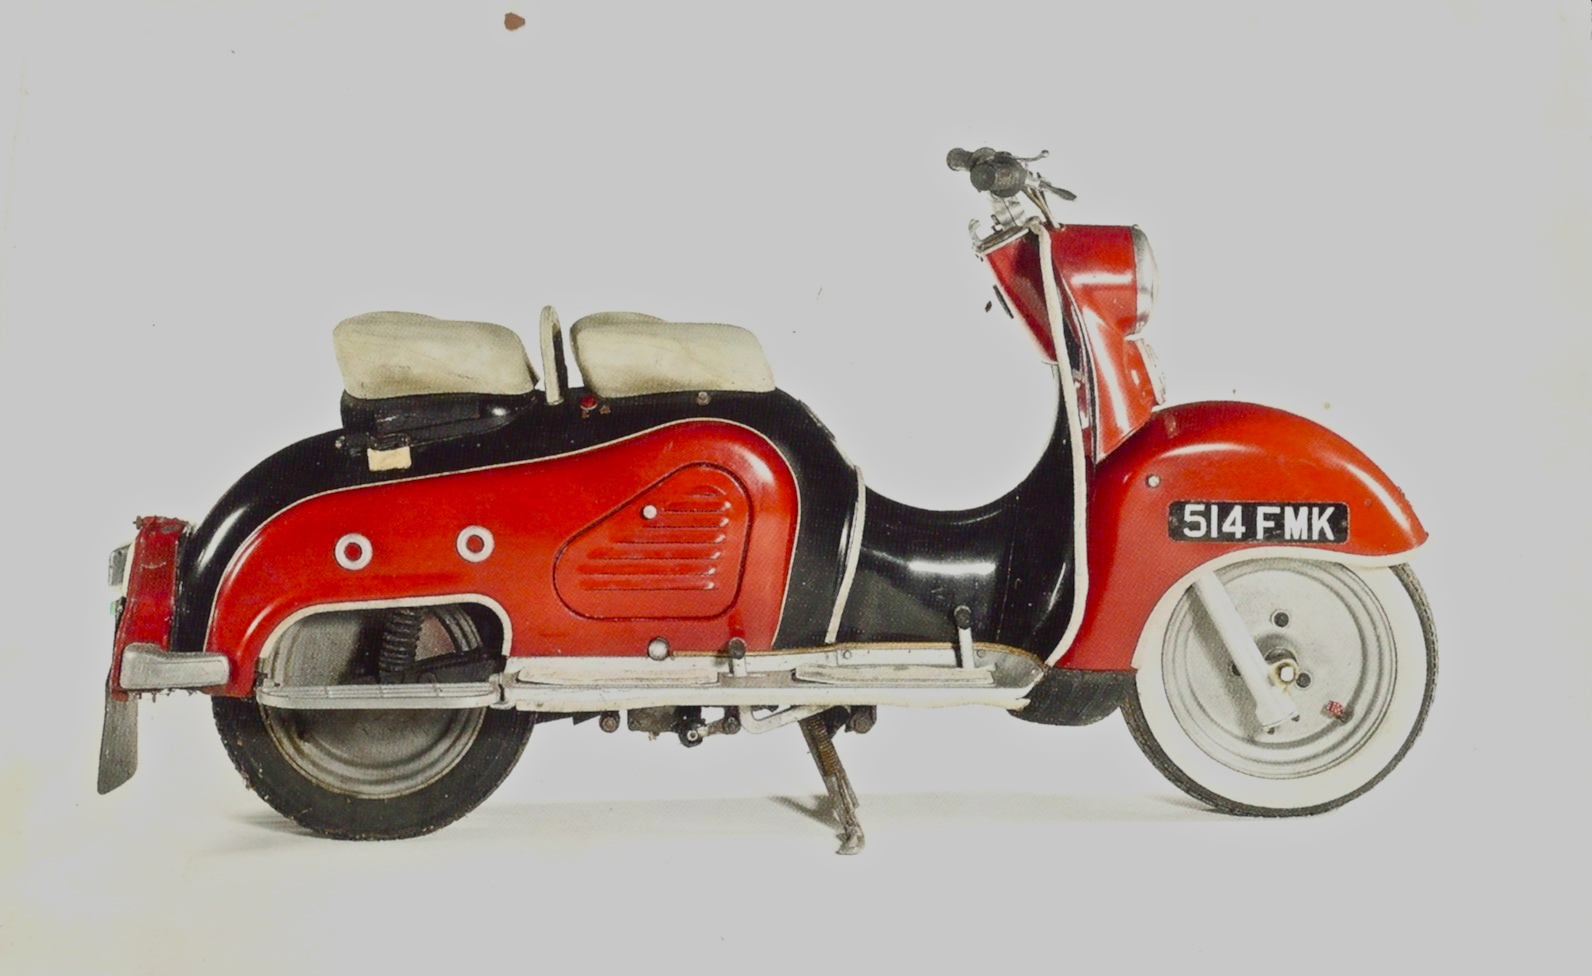 scooter.jpeg